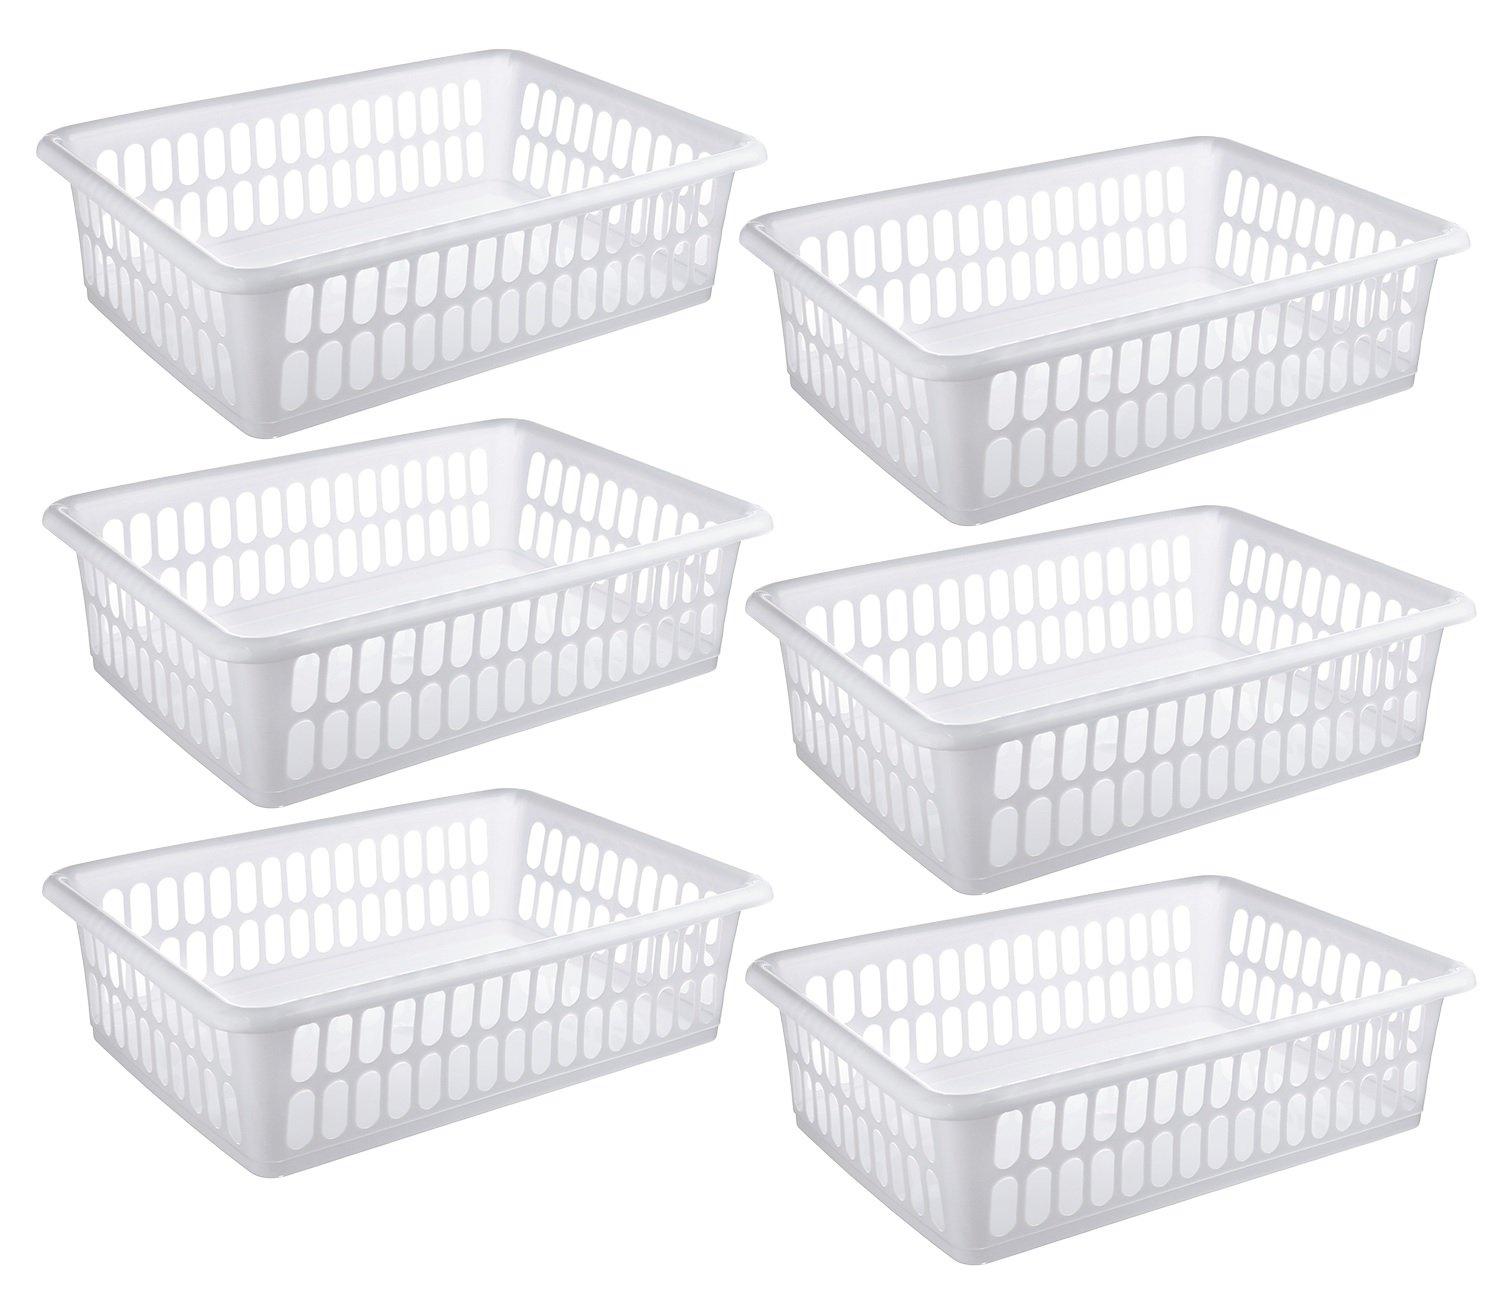 Zilpoo 6 Pack - Plastic Storage Organizing Basket, Cabinet Shelf Kitchen Drawer Refrigerator, Freezer Organizer Bins, 15'' x 10'', White by Zilpoo (Image #1)